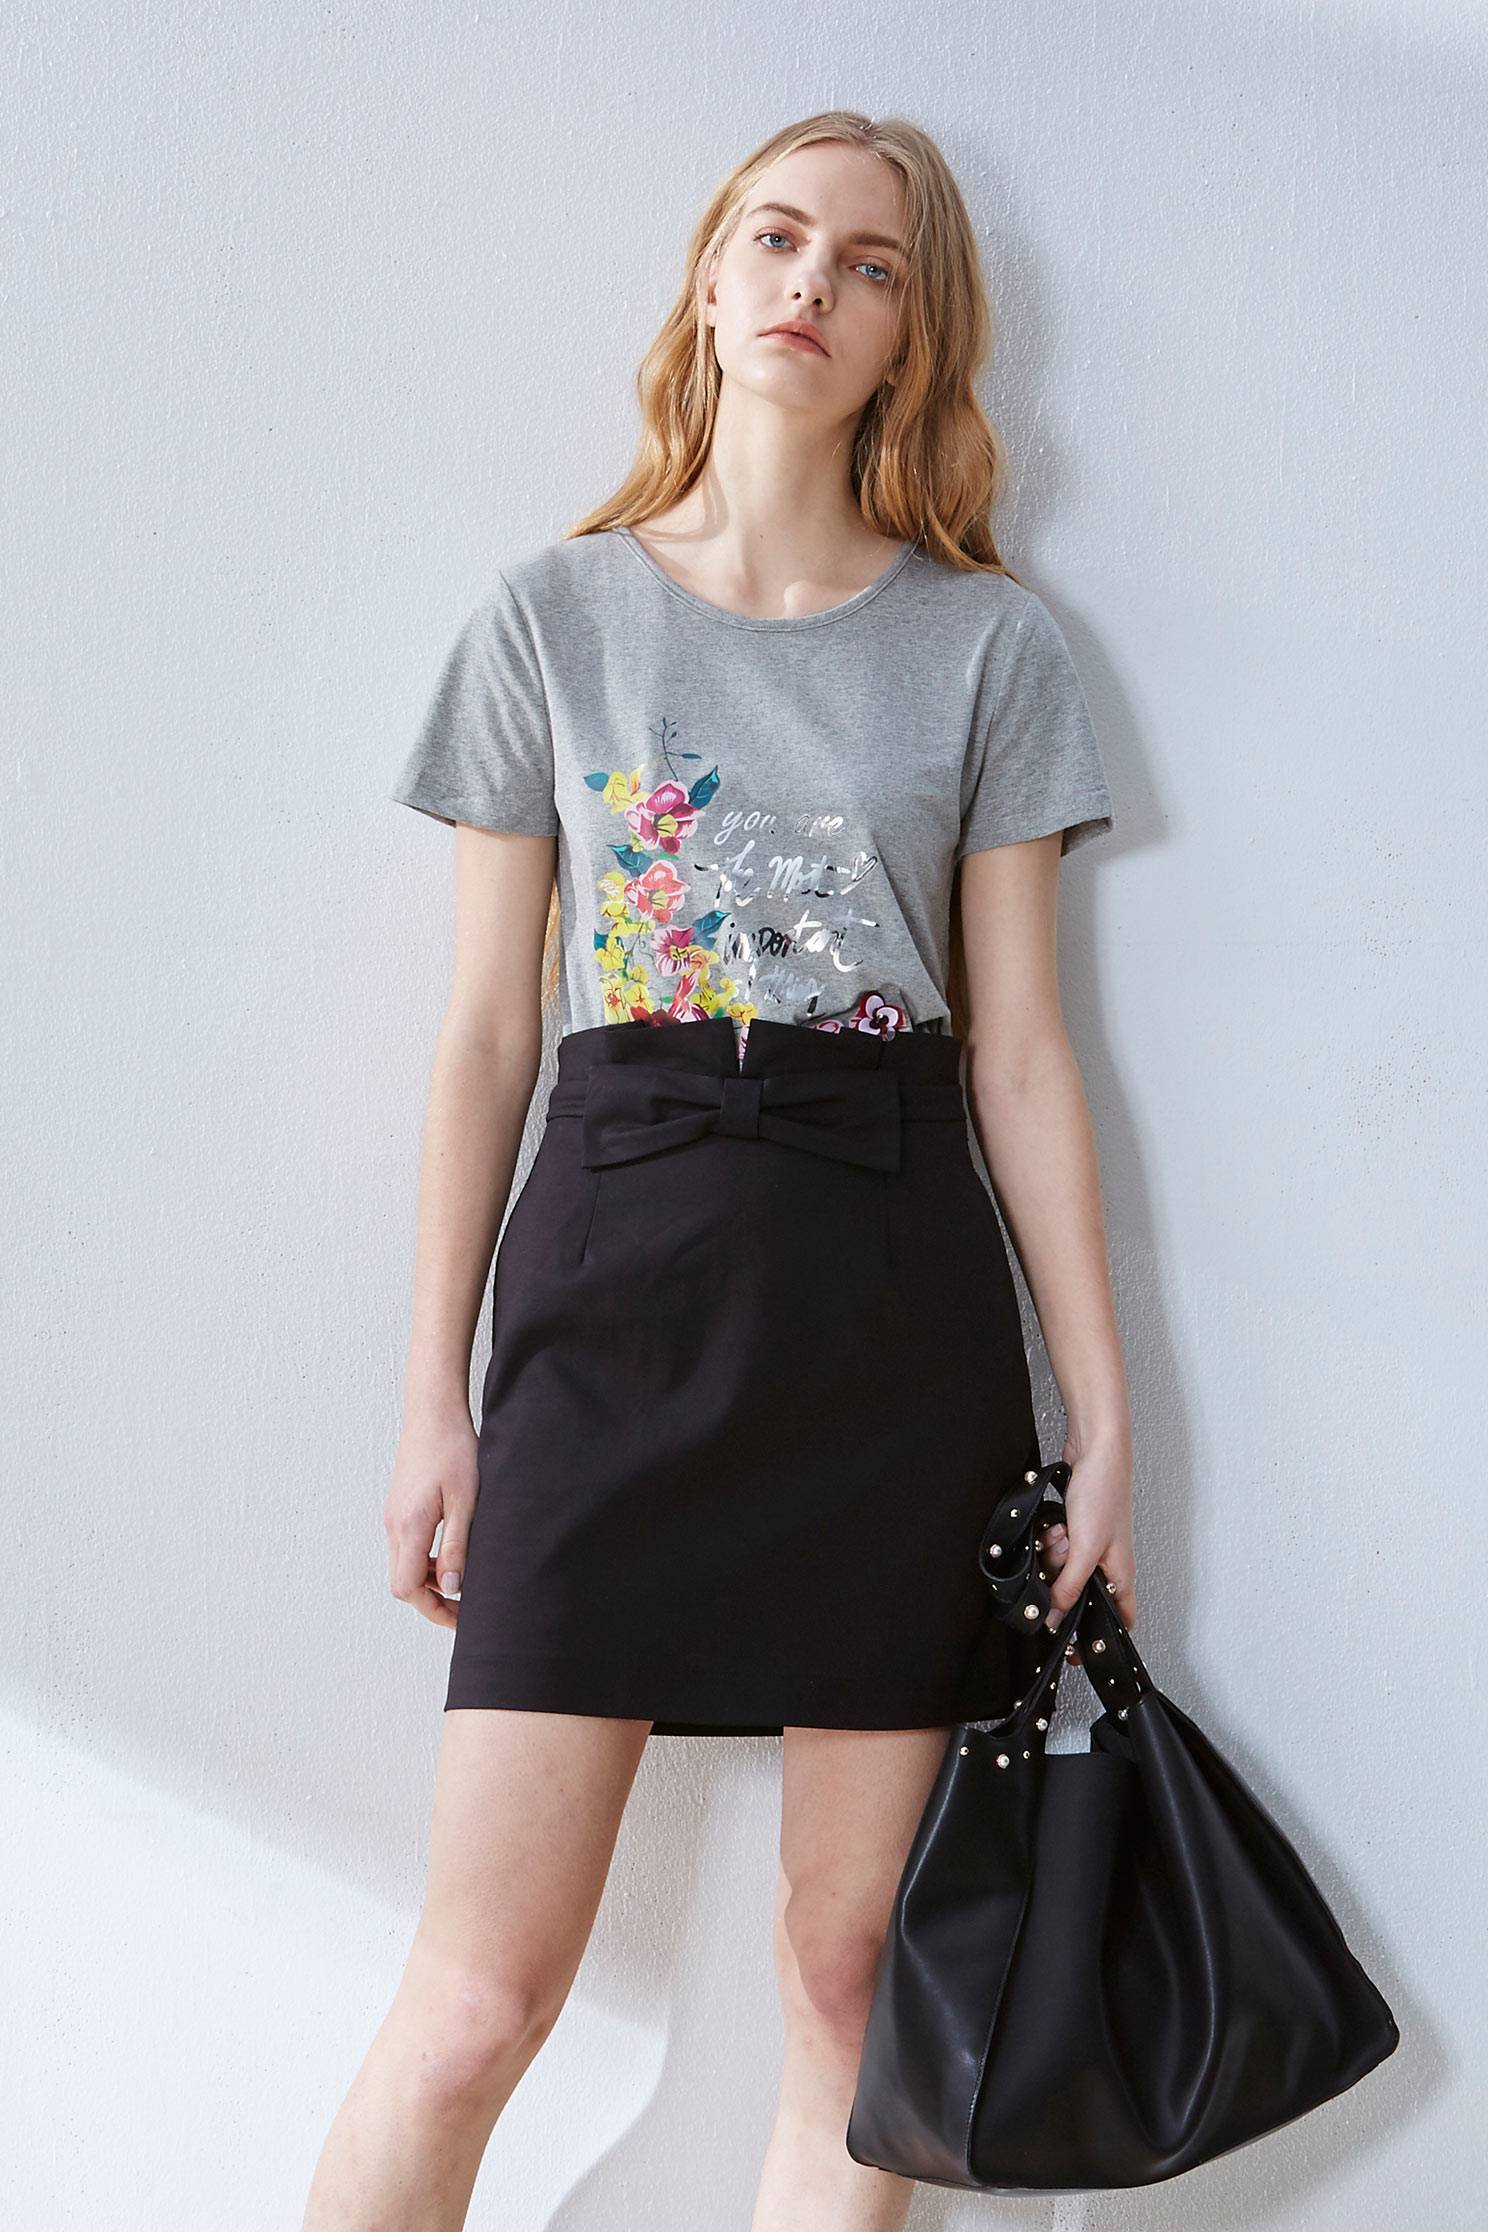 Romantic flower T-shirt